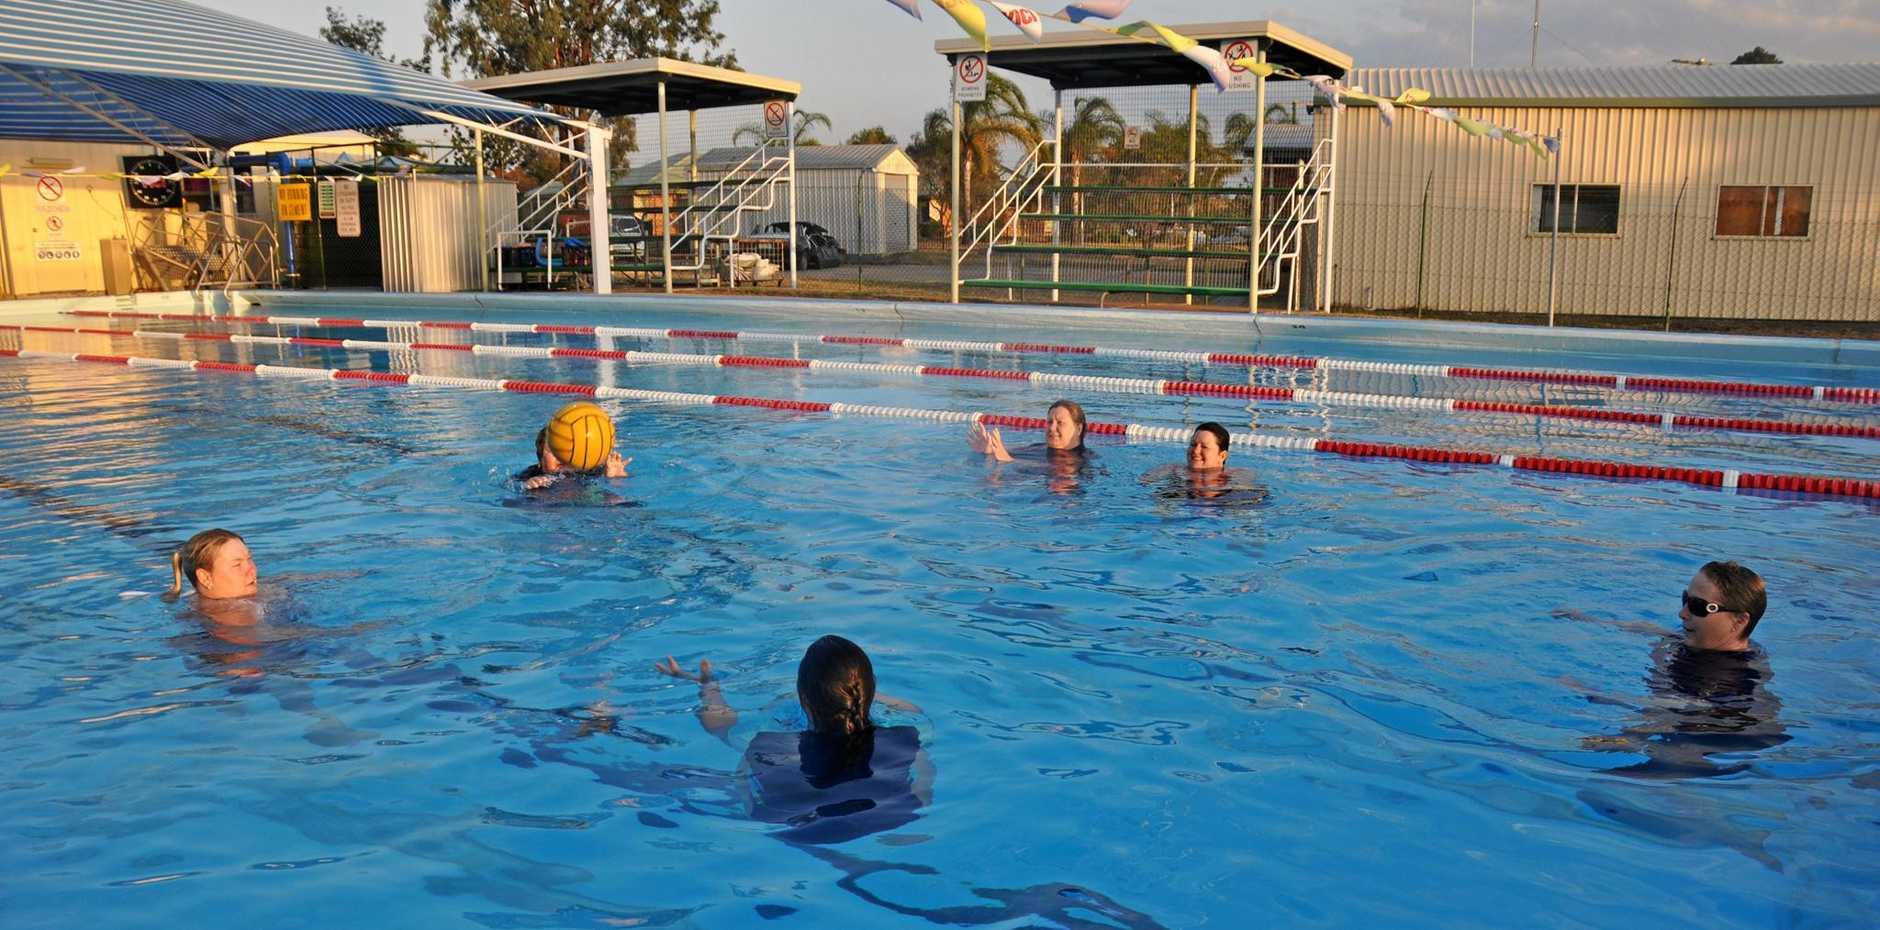 WATER FITNESS: Aqua aerobics classes are held three evenings a week at Monto pool.